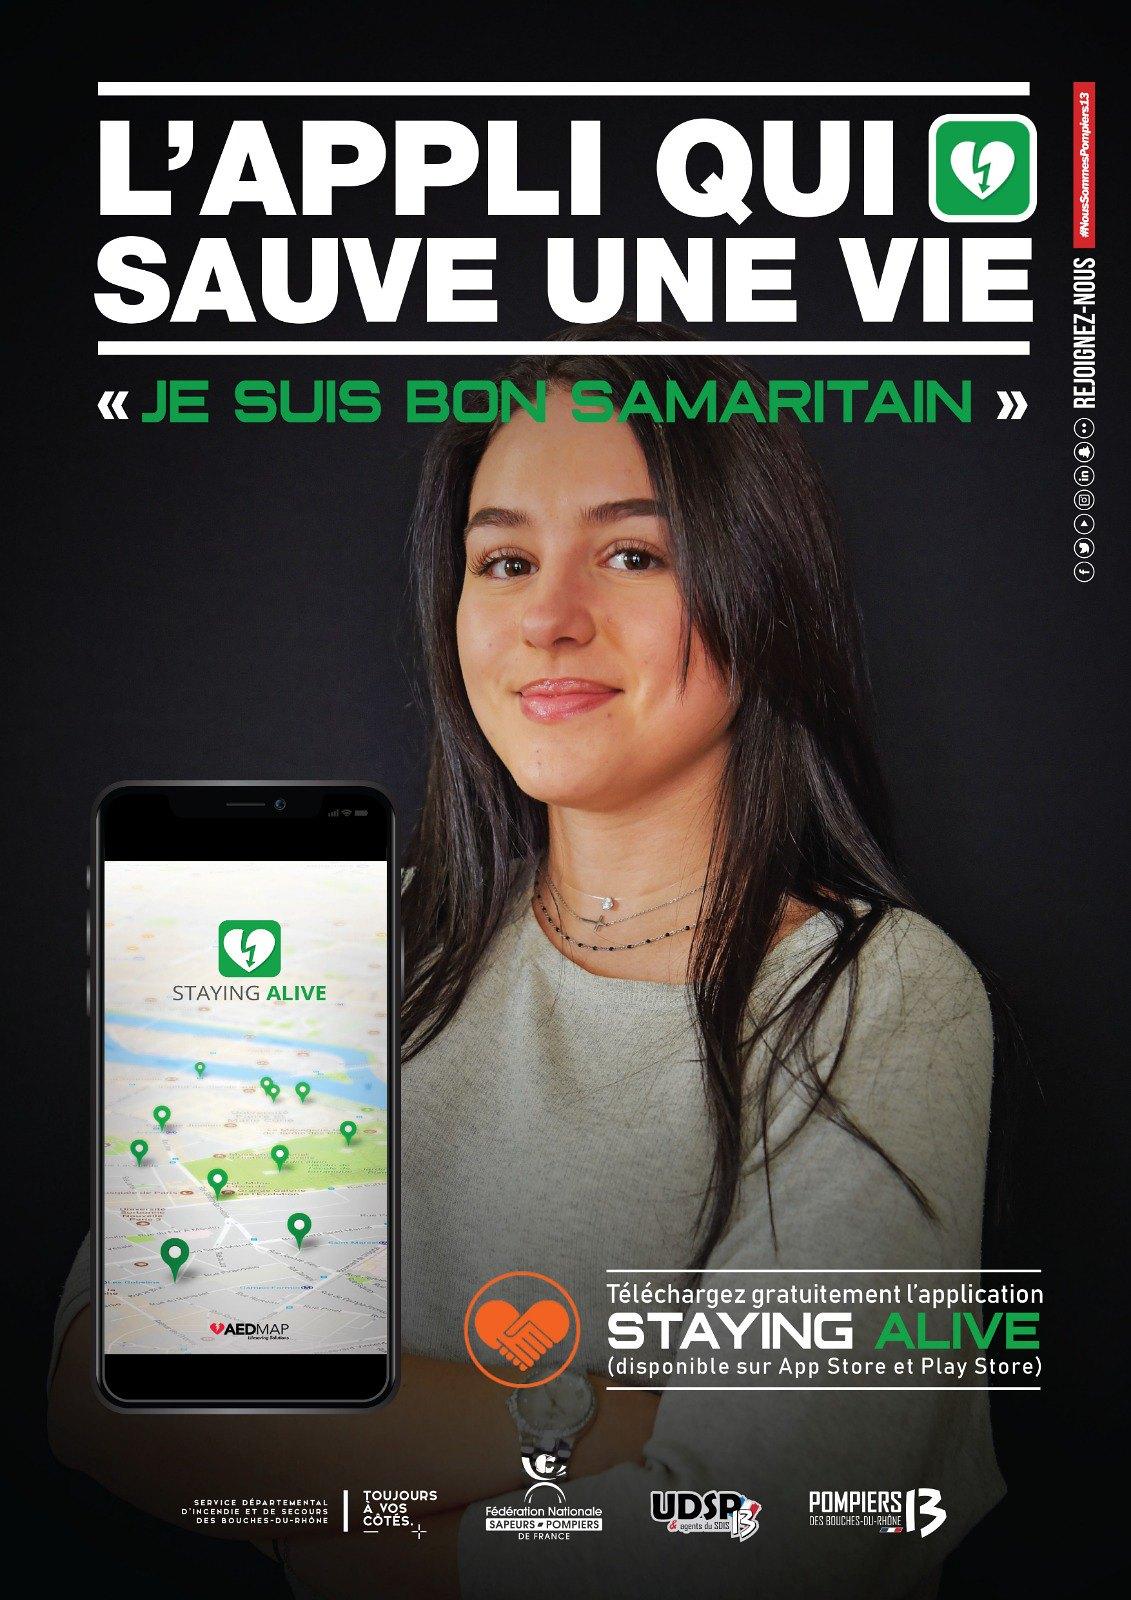 Devenez bon samaritain avec l'application Staying alive